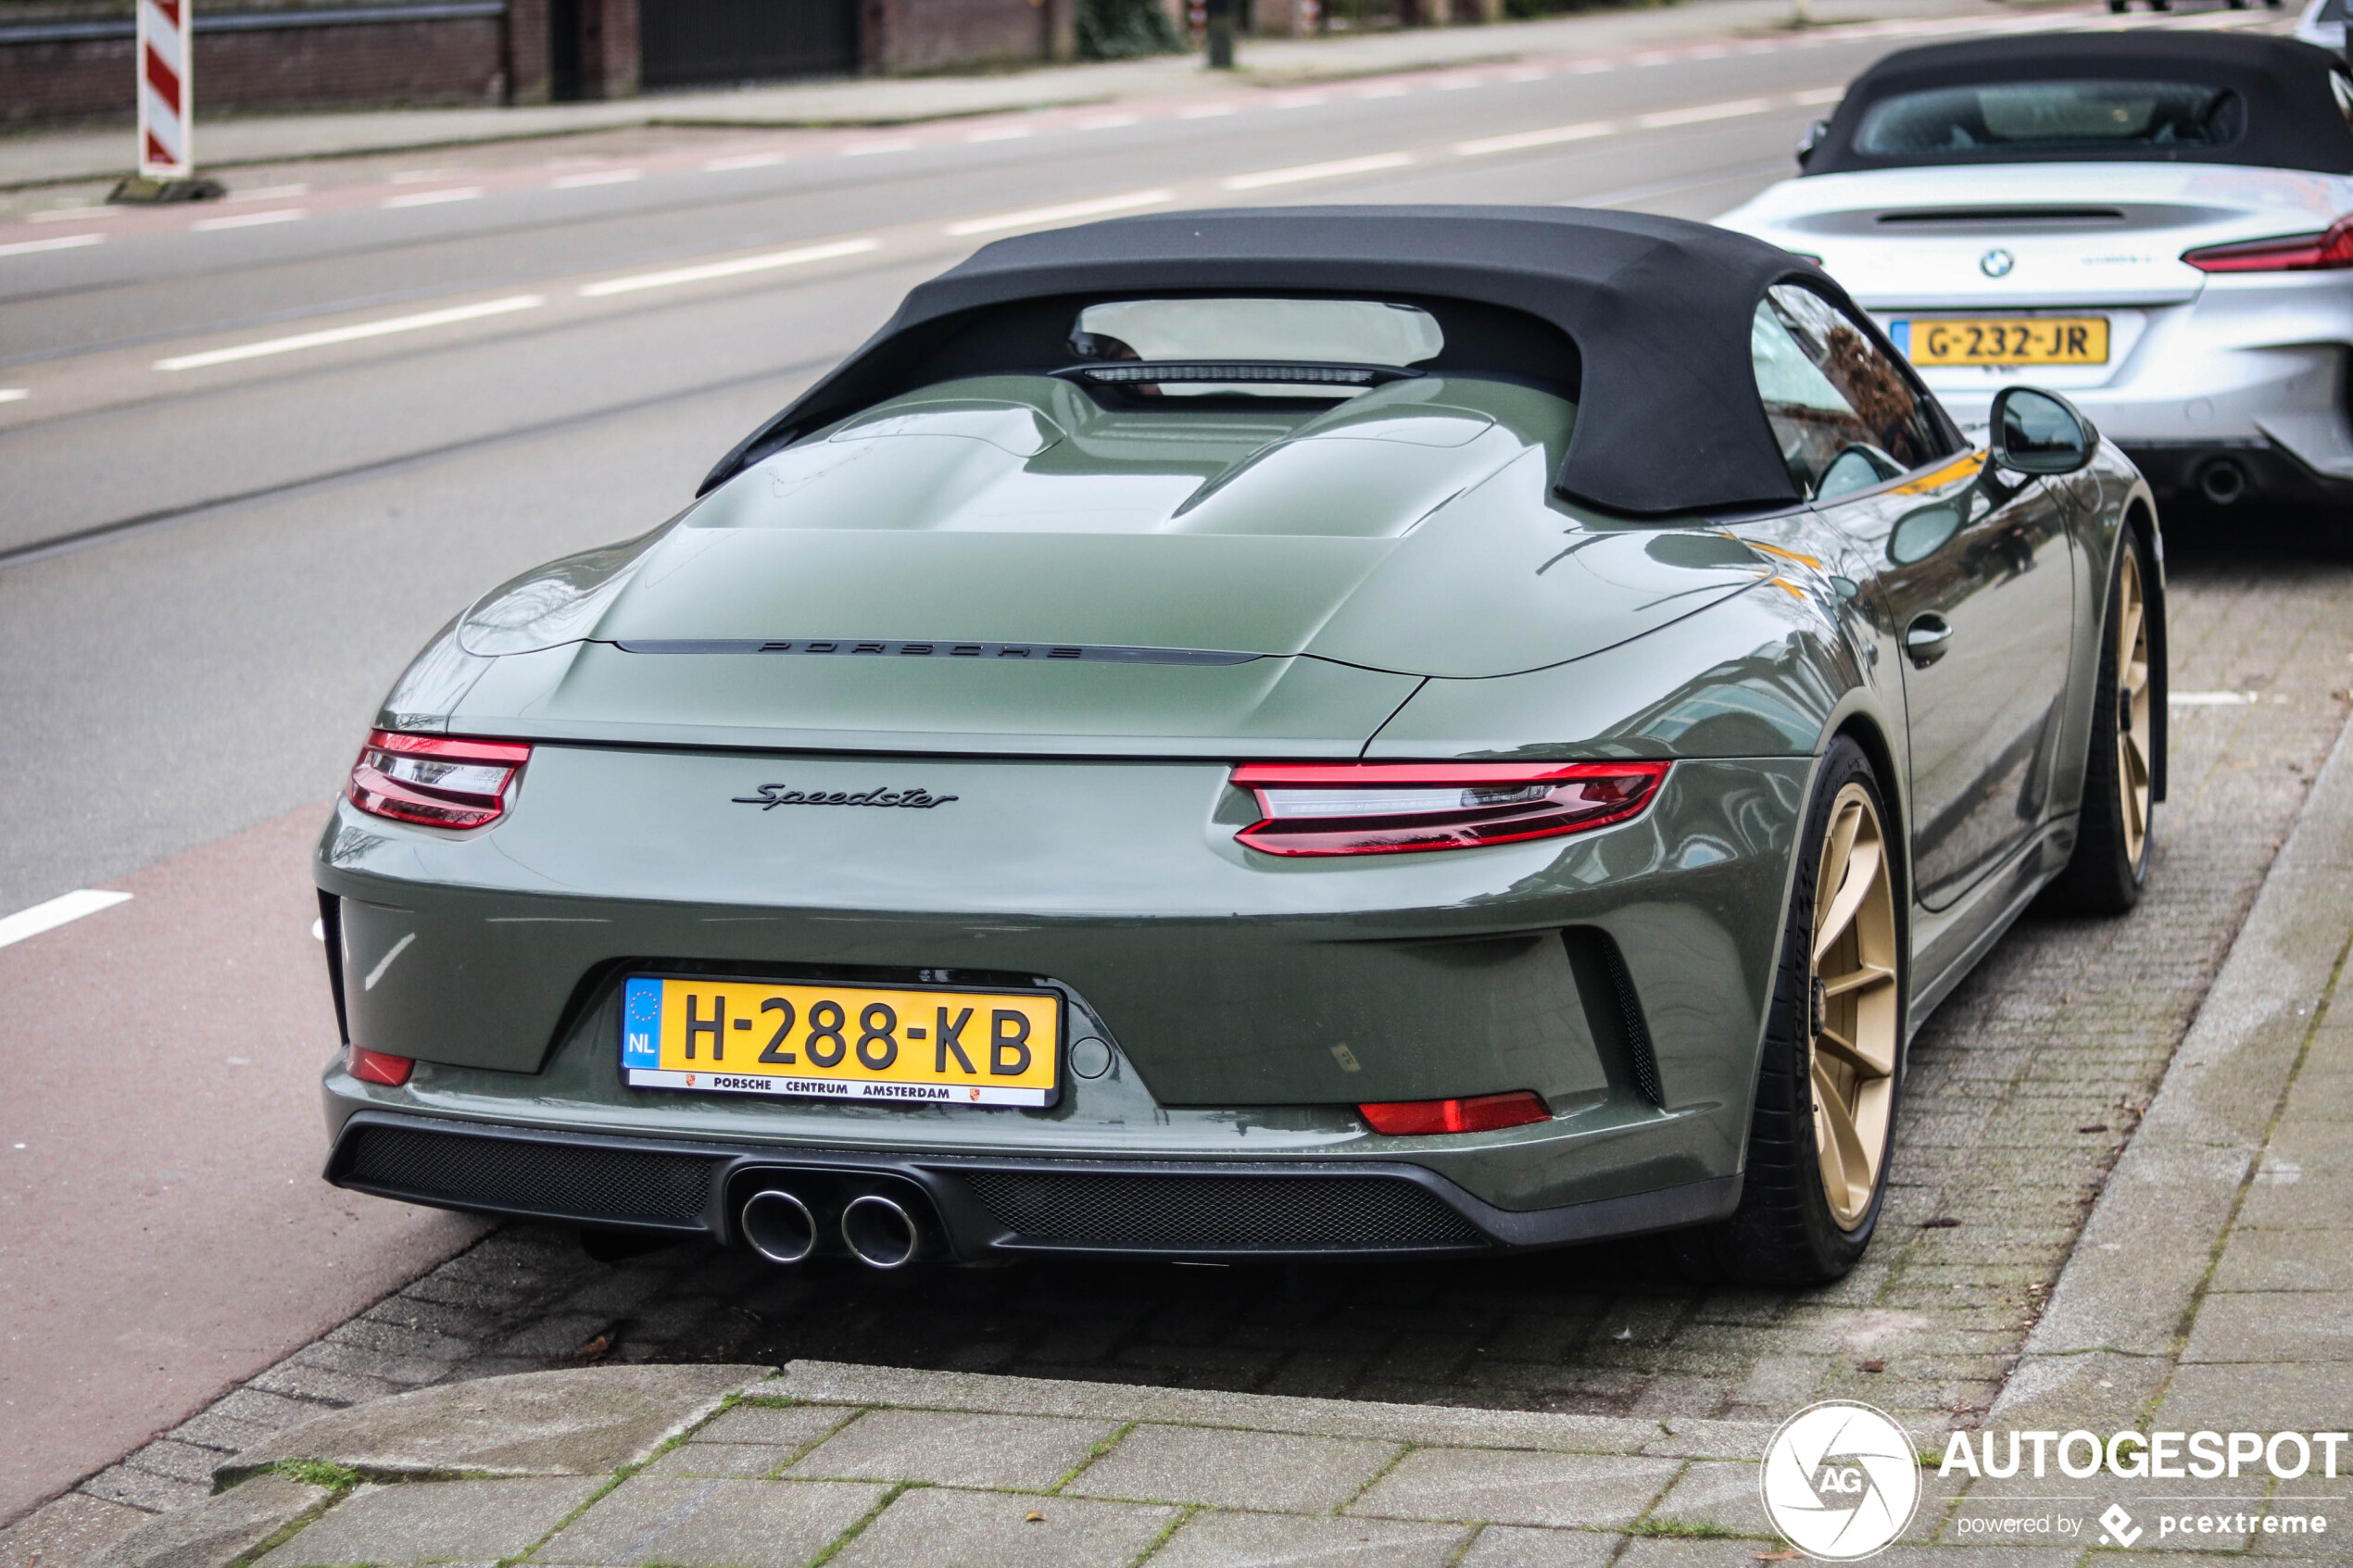 Porsche Speedster in a near perfect configuration